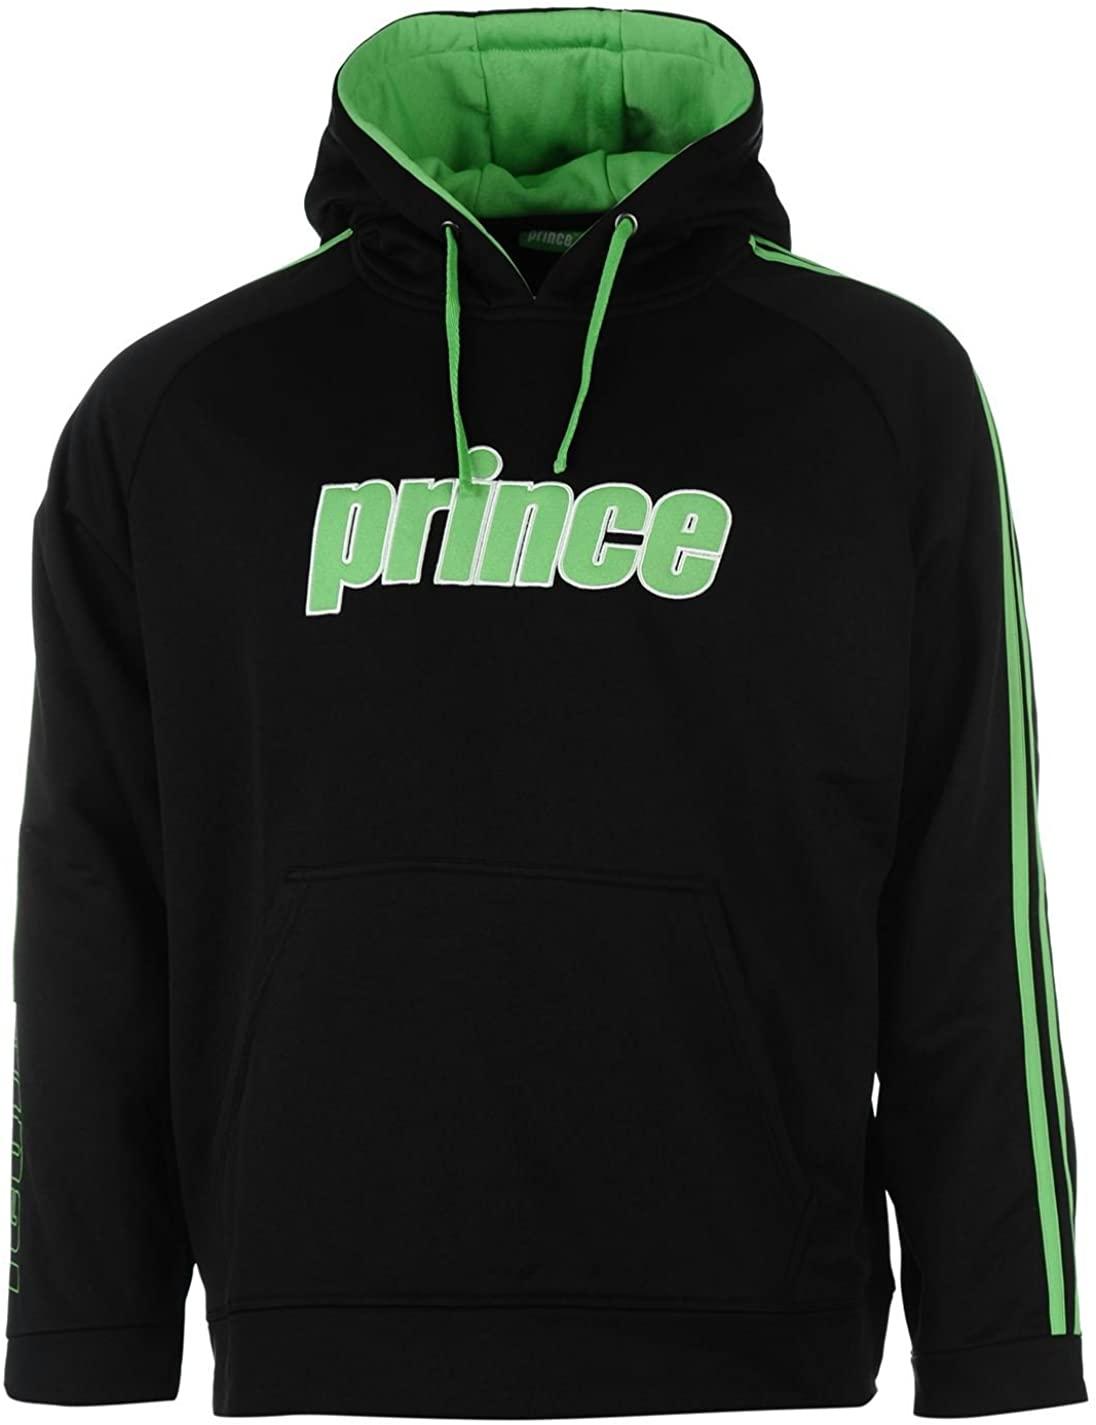 Prince Pullover Men`s Hoodie Black/Green (Large)